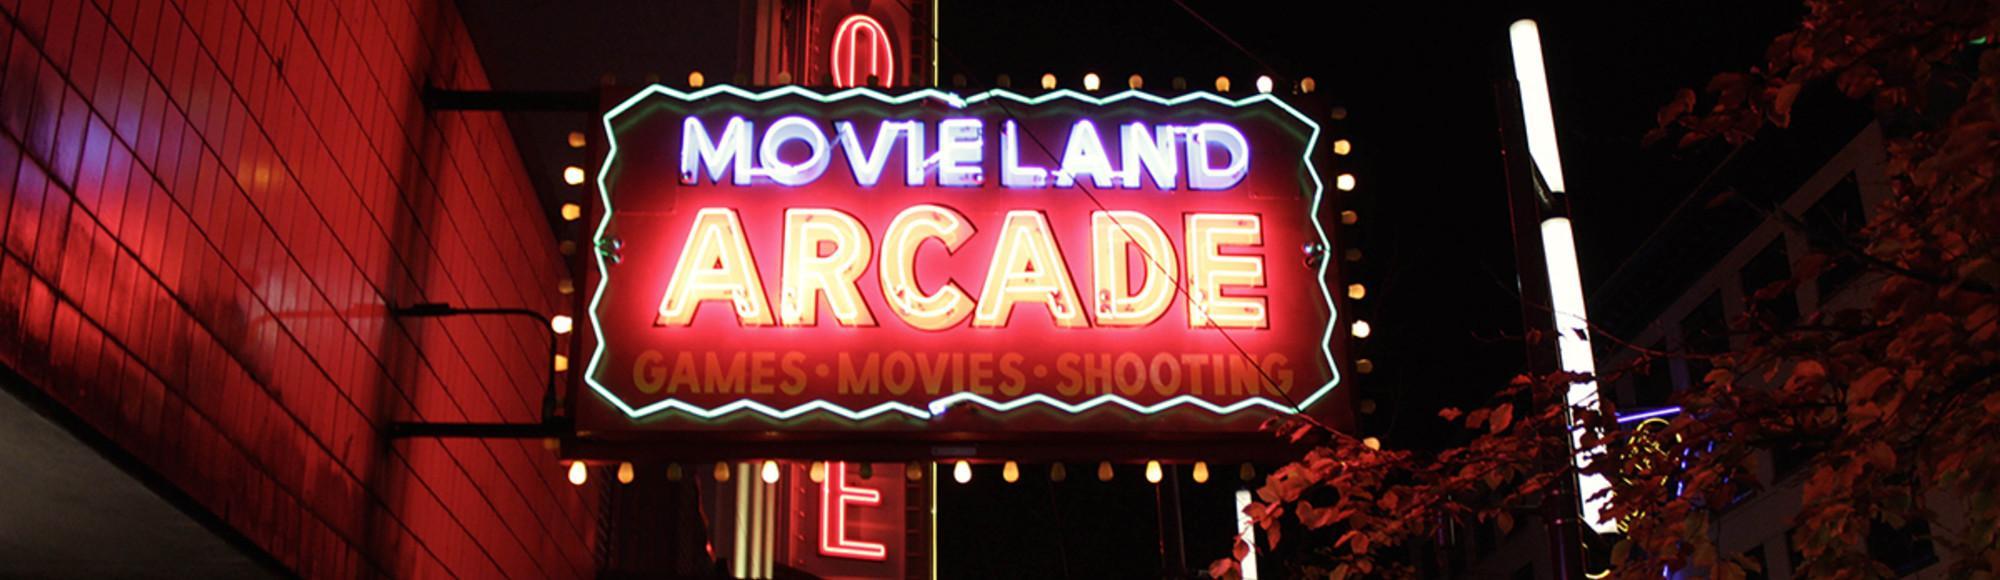 'The World's Last 8mm Peepshow'